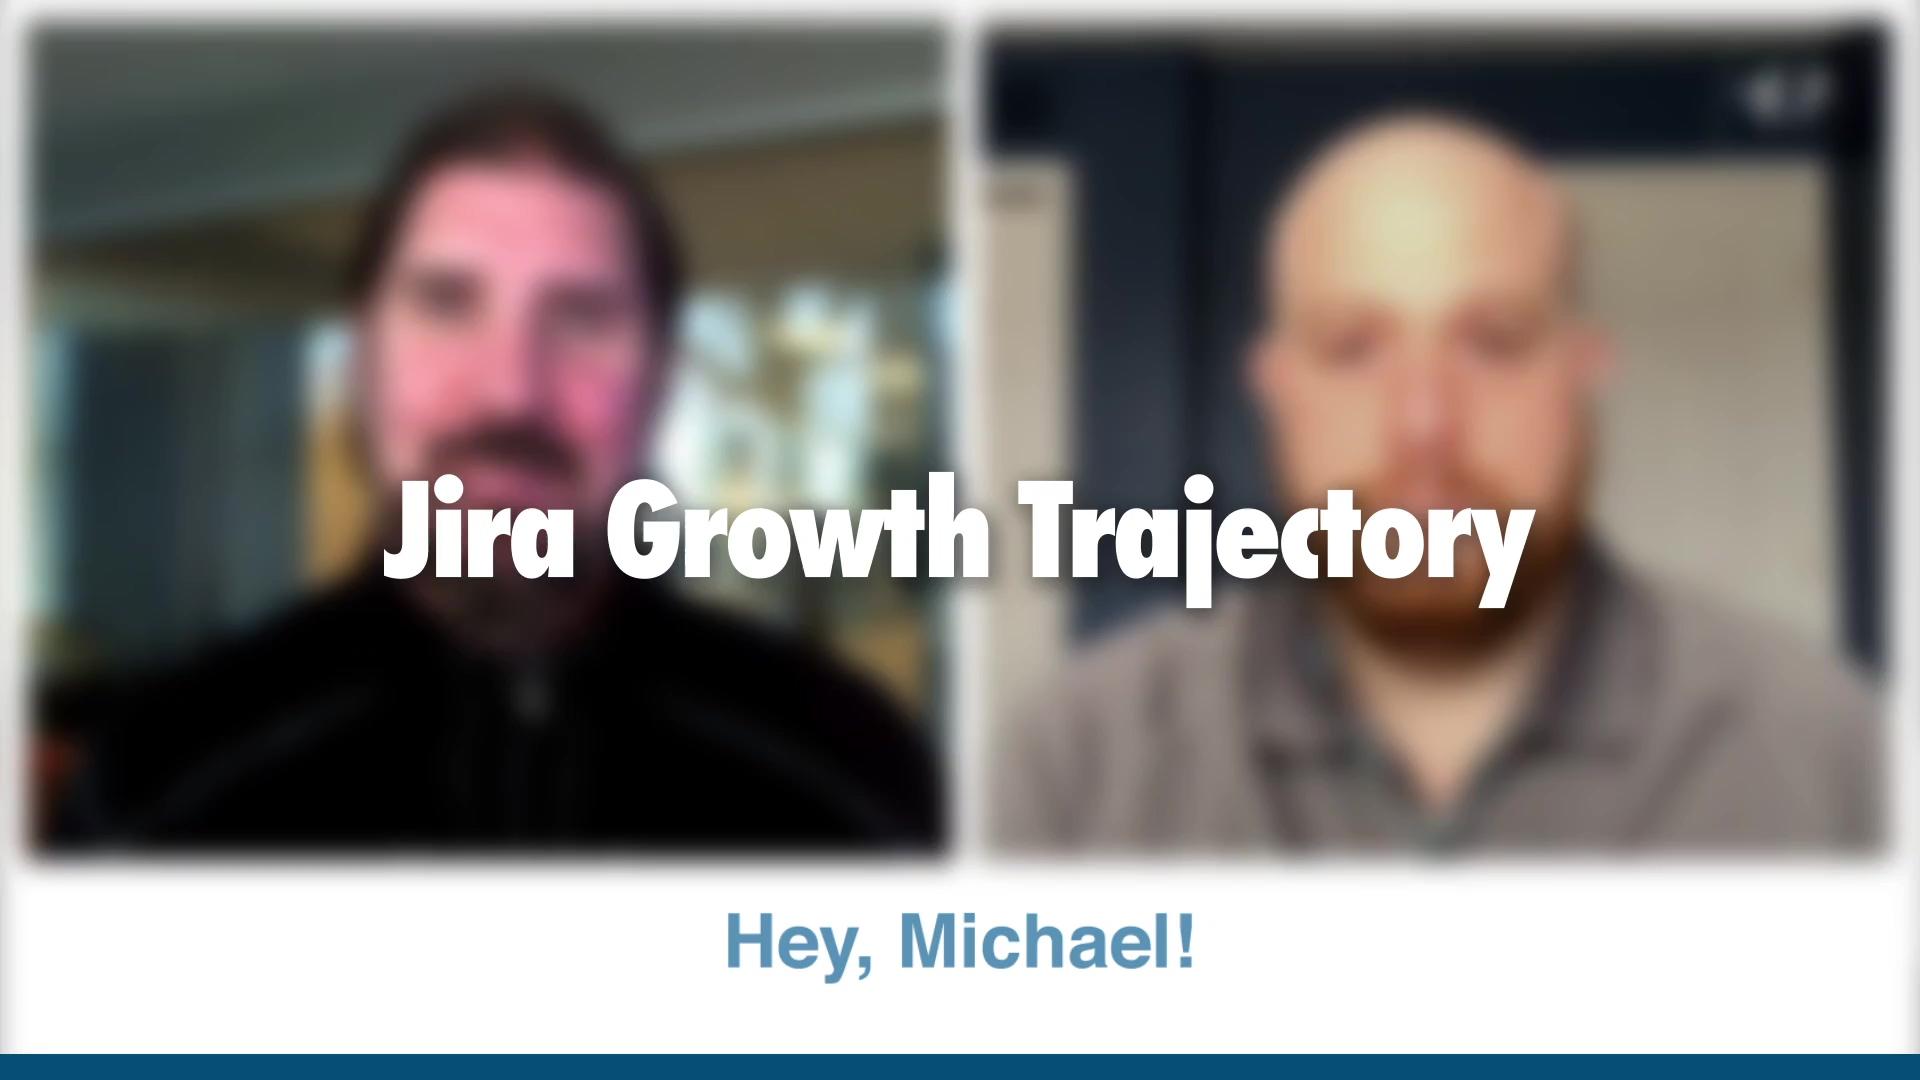 Jira Growth Trajectory - LinkedIn